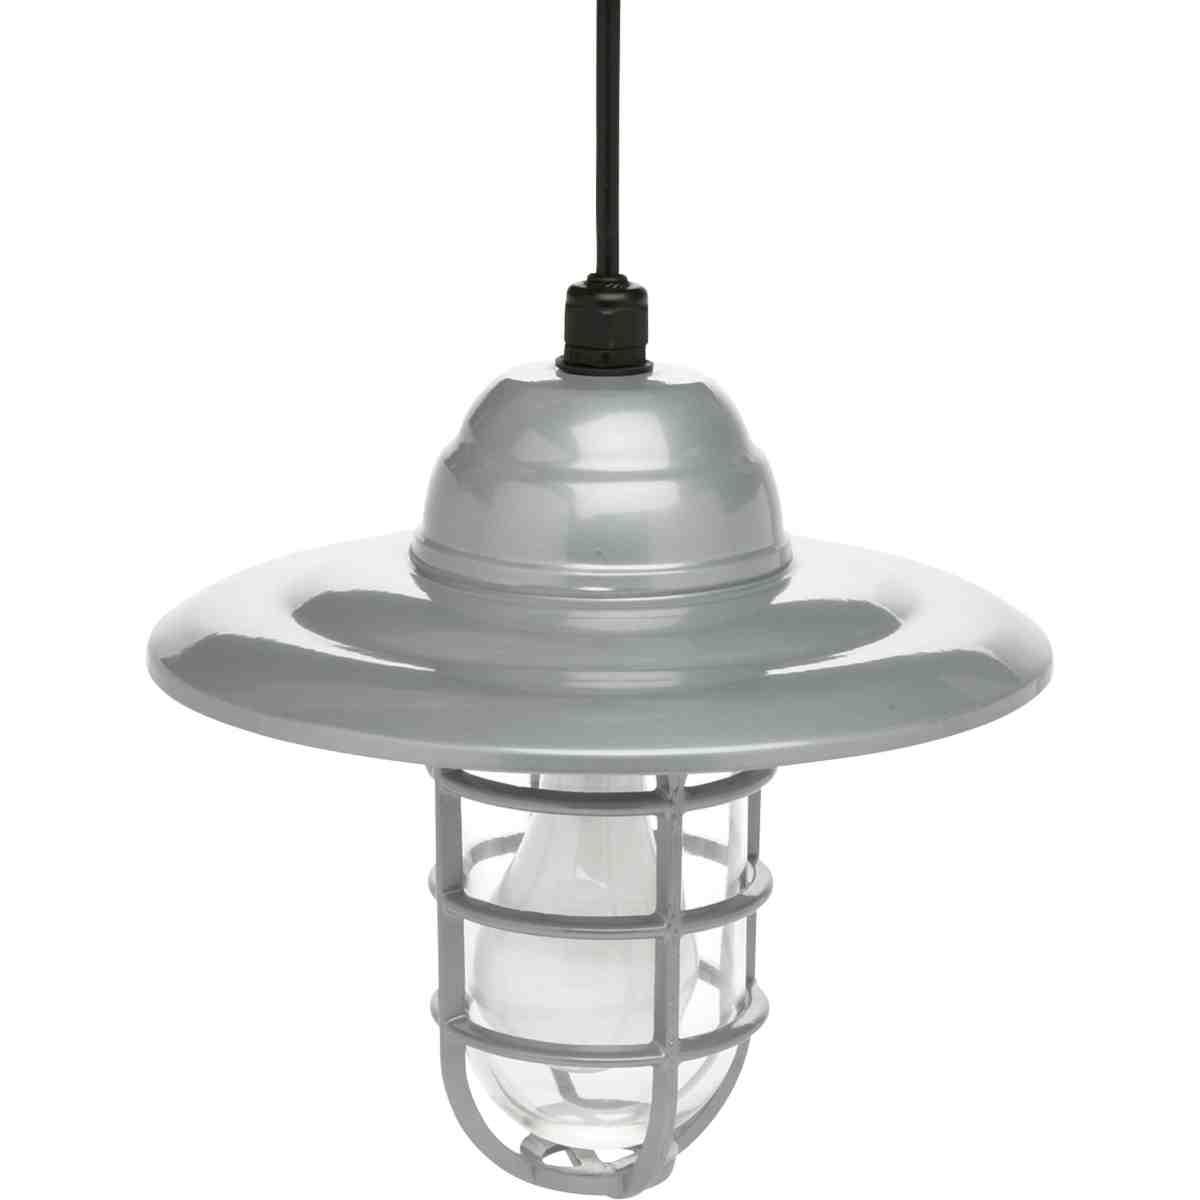 Outdoor Barn Lighting Fixtures Decor IdeasDecor Ideas